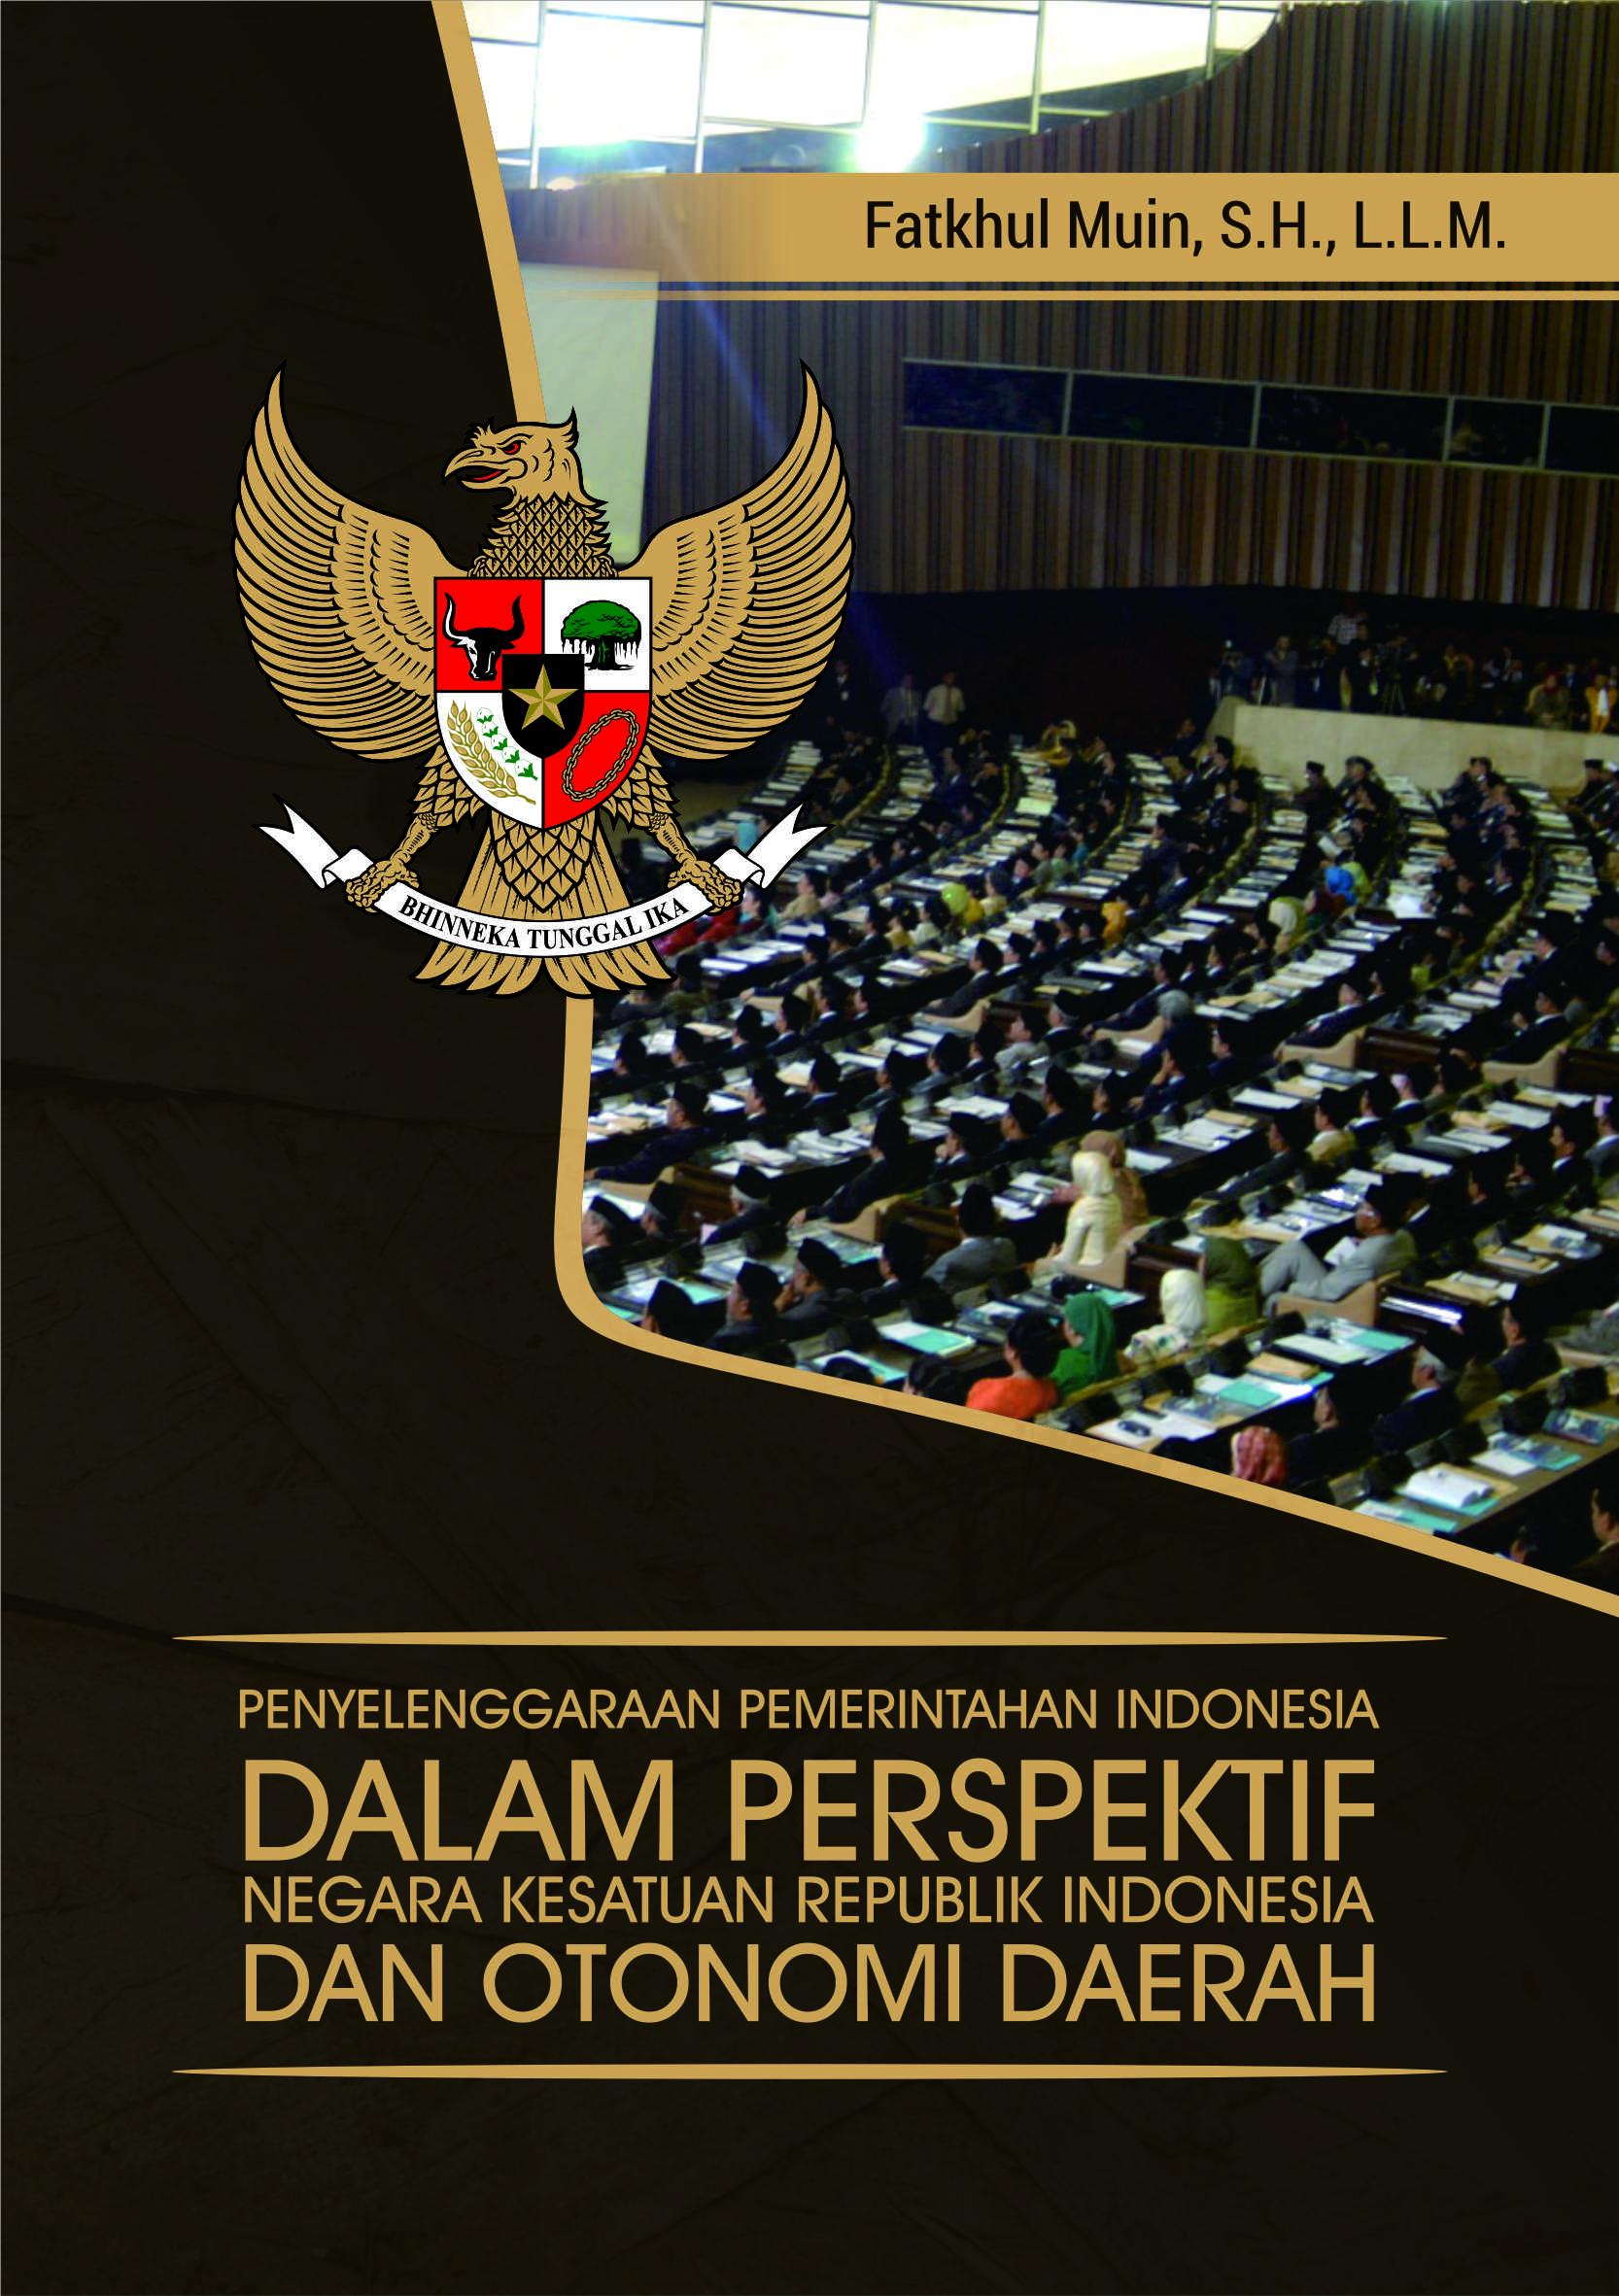 Penyelenggaraan pemerintahan Indonesia dalam persepektif negara kesatuan Republik Indonesia dan otonomi daerah [sumber elektronis]